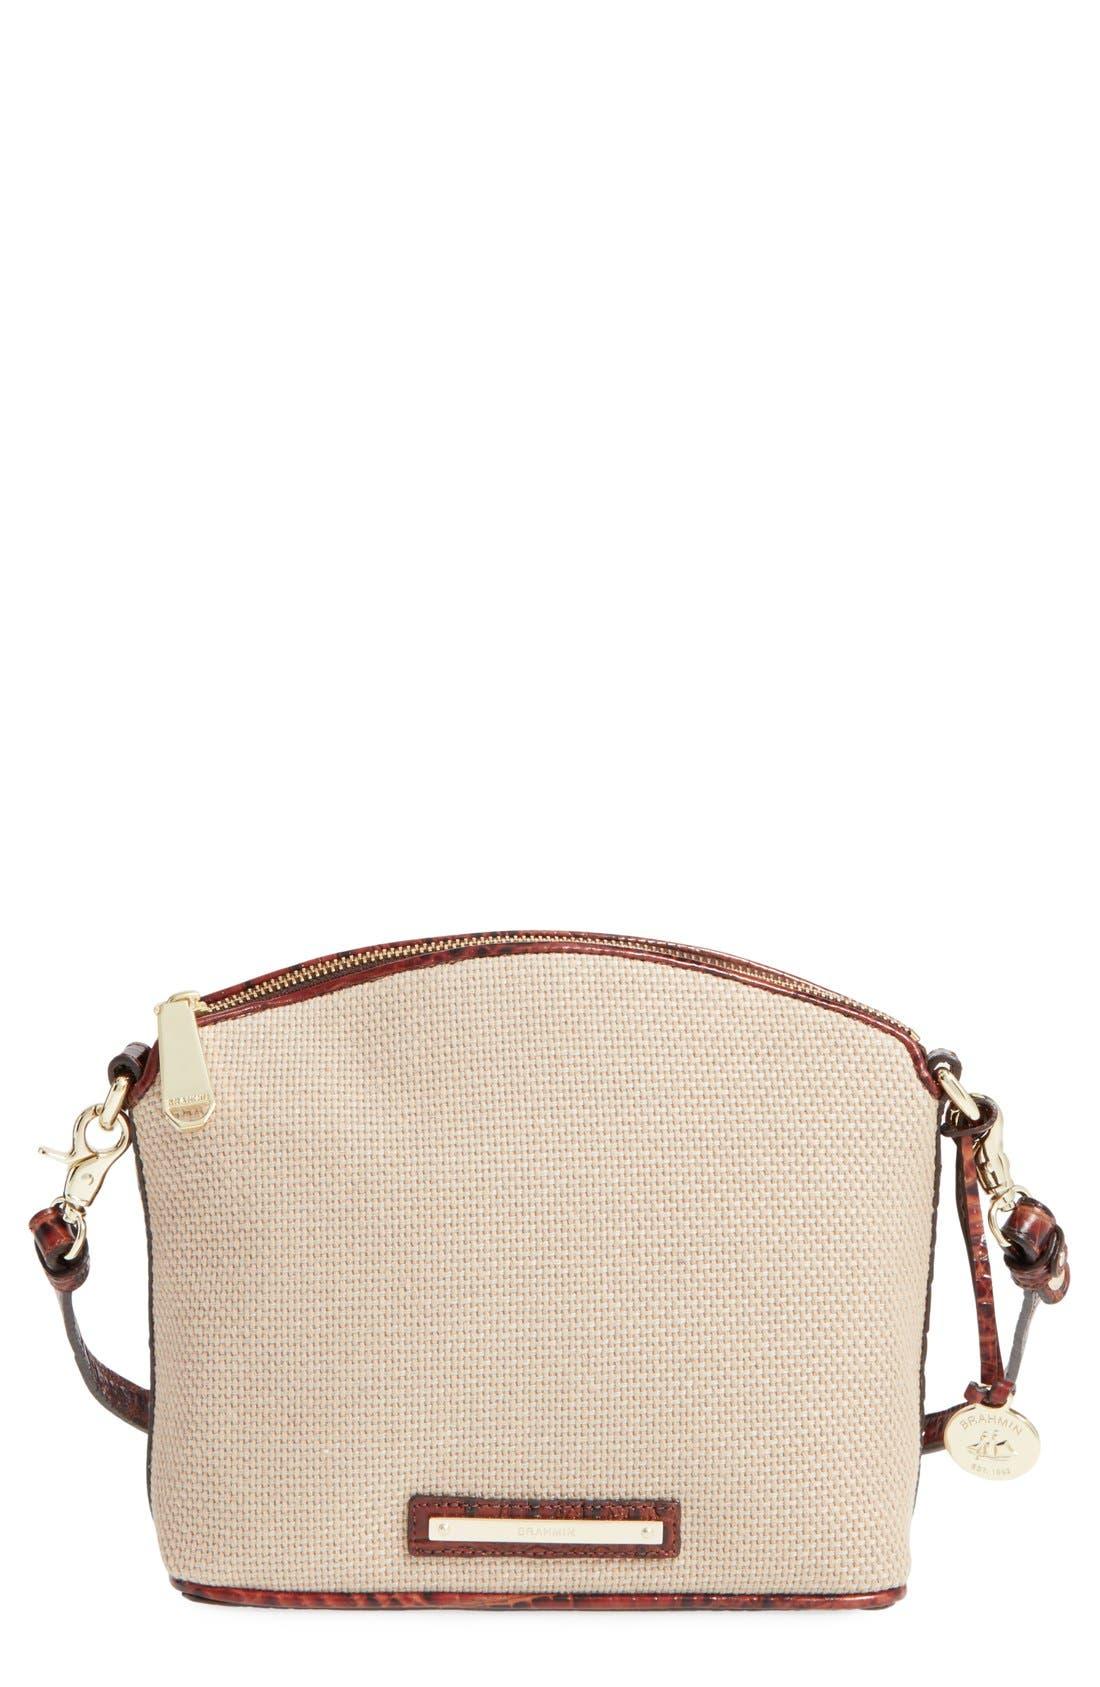 Alternate Image 1 Selected - Brahmin 'Mini Duxbury' Woven Crossbody Bag